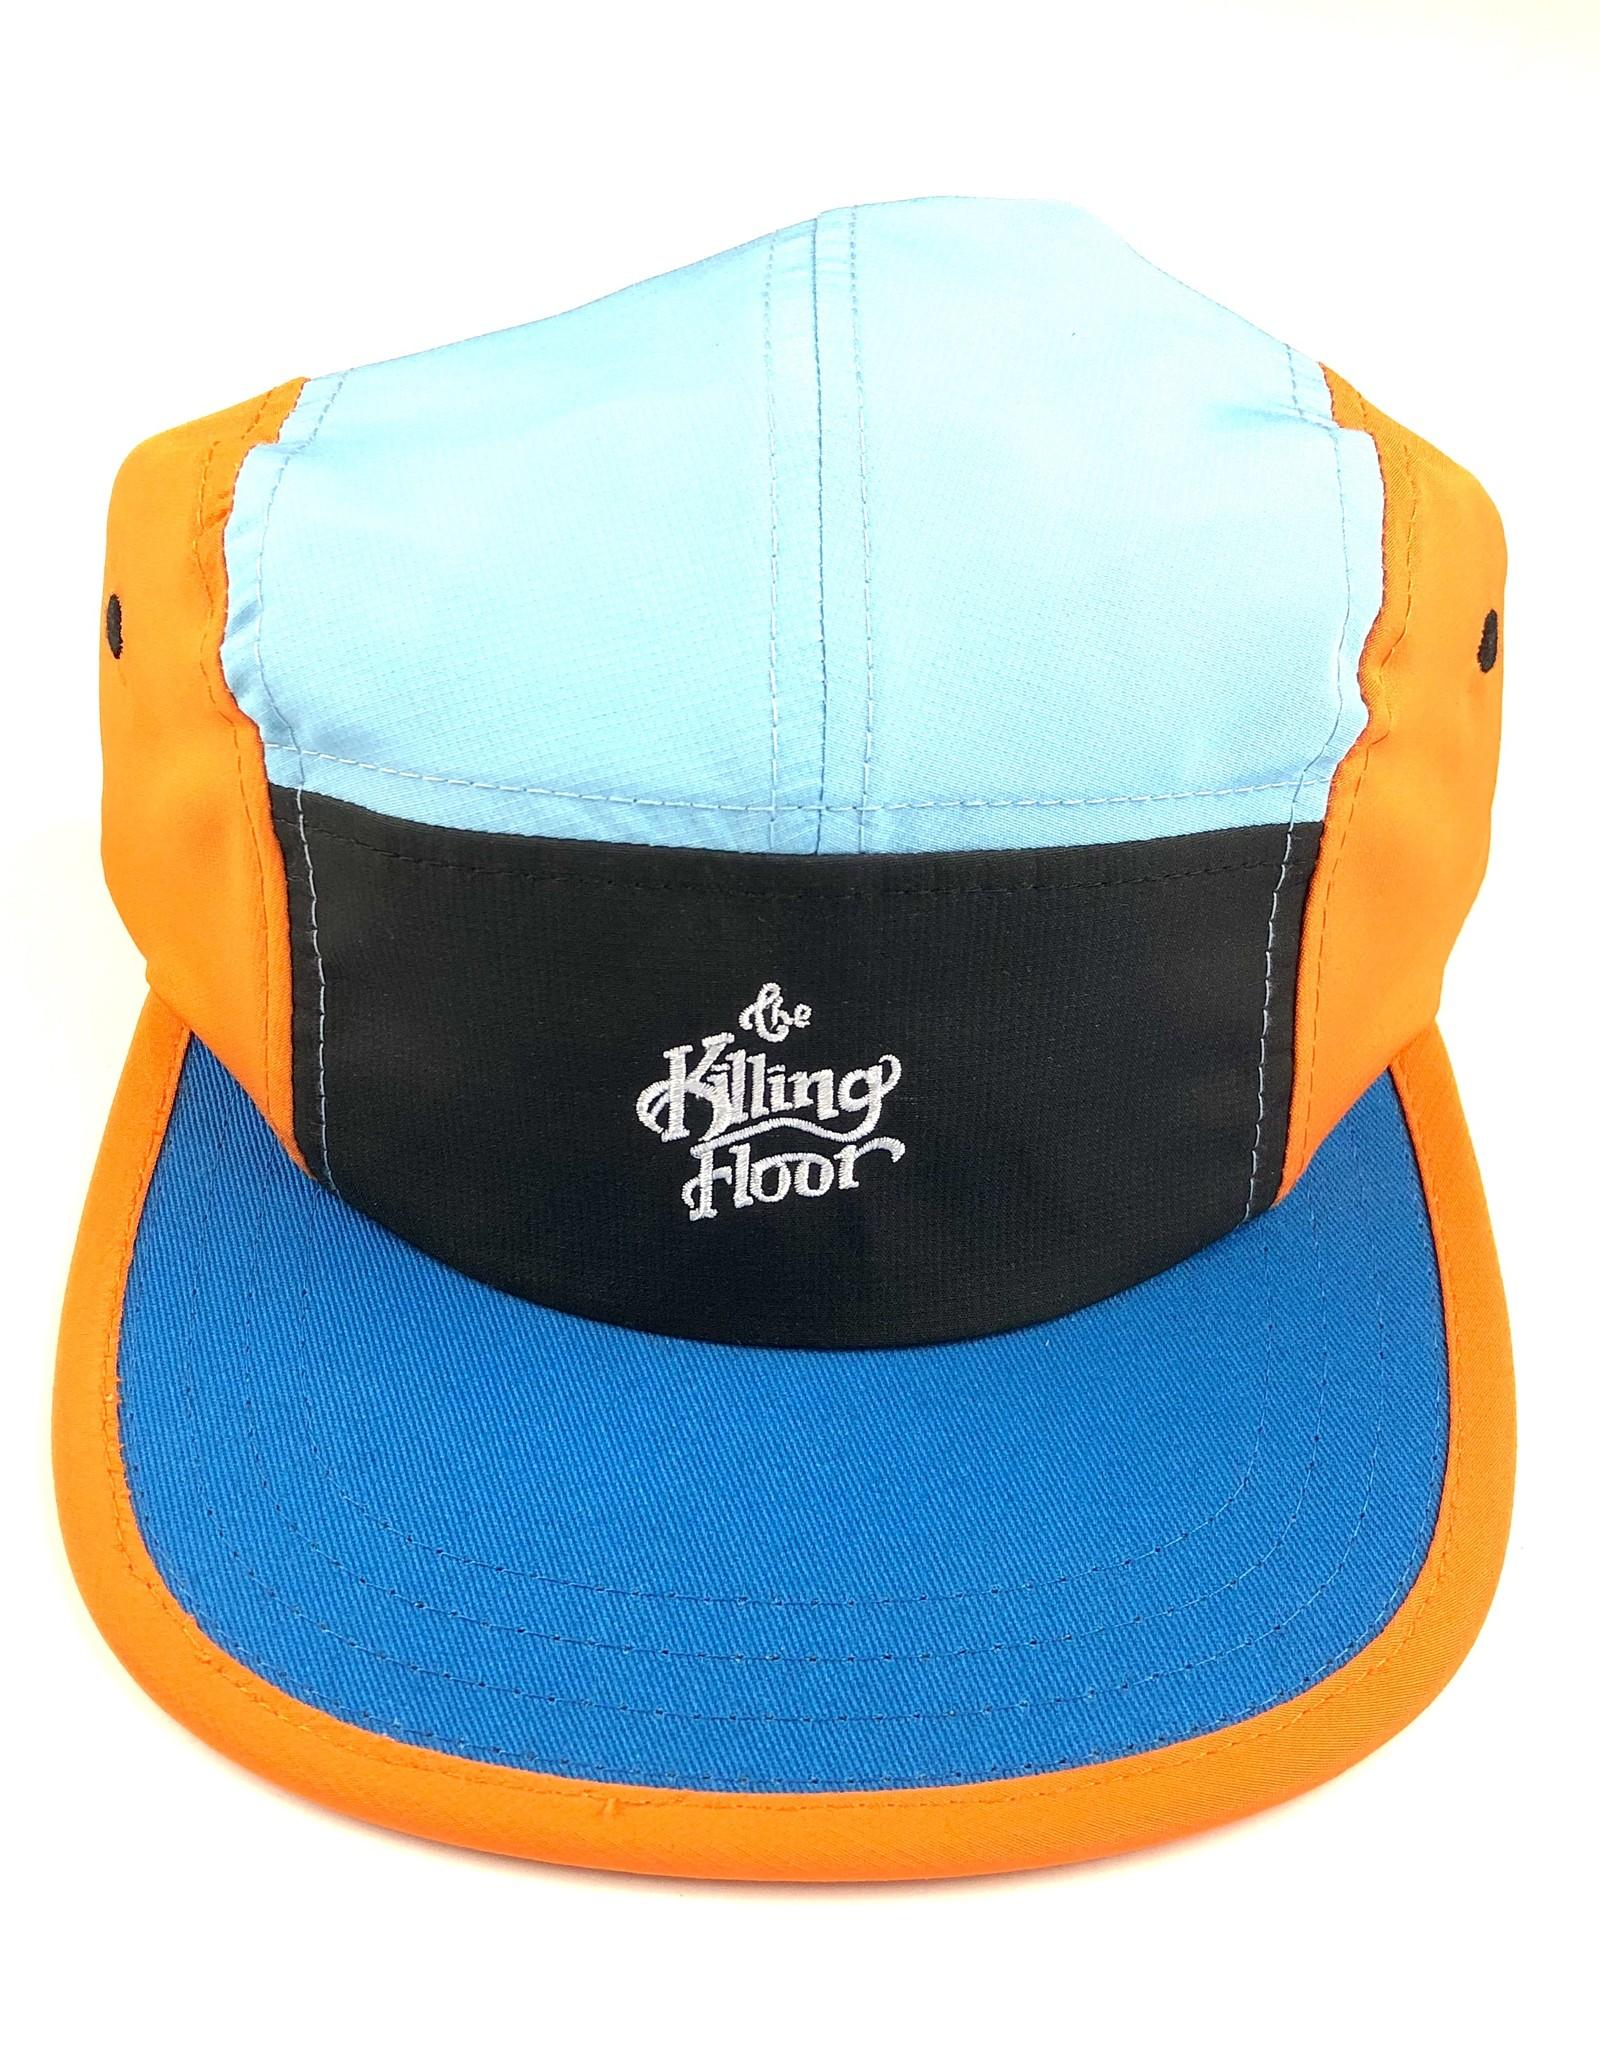 THE KILLING FLOOR THE KILLING FLOOR COLORS VOLLEY CAP HAT - ORANGE/CERULEAN